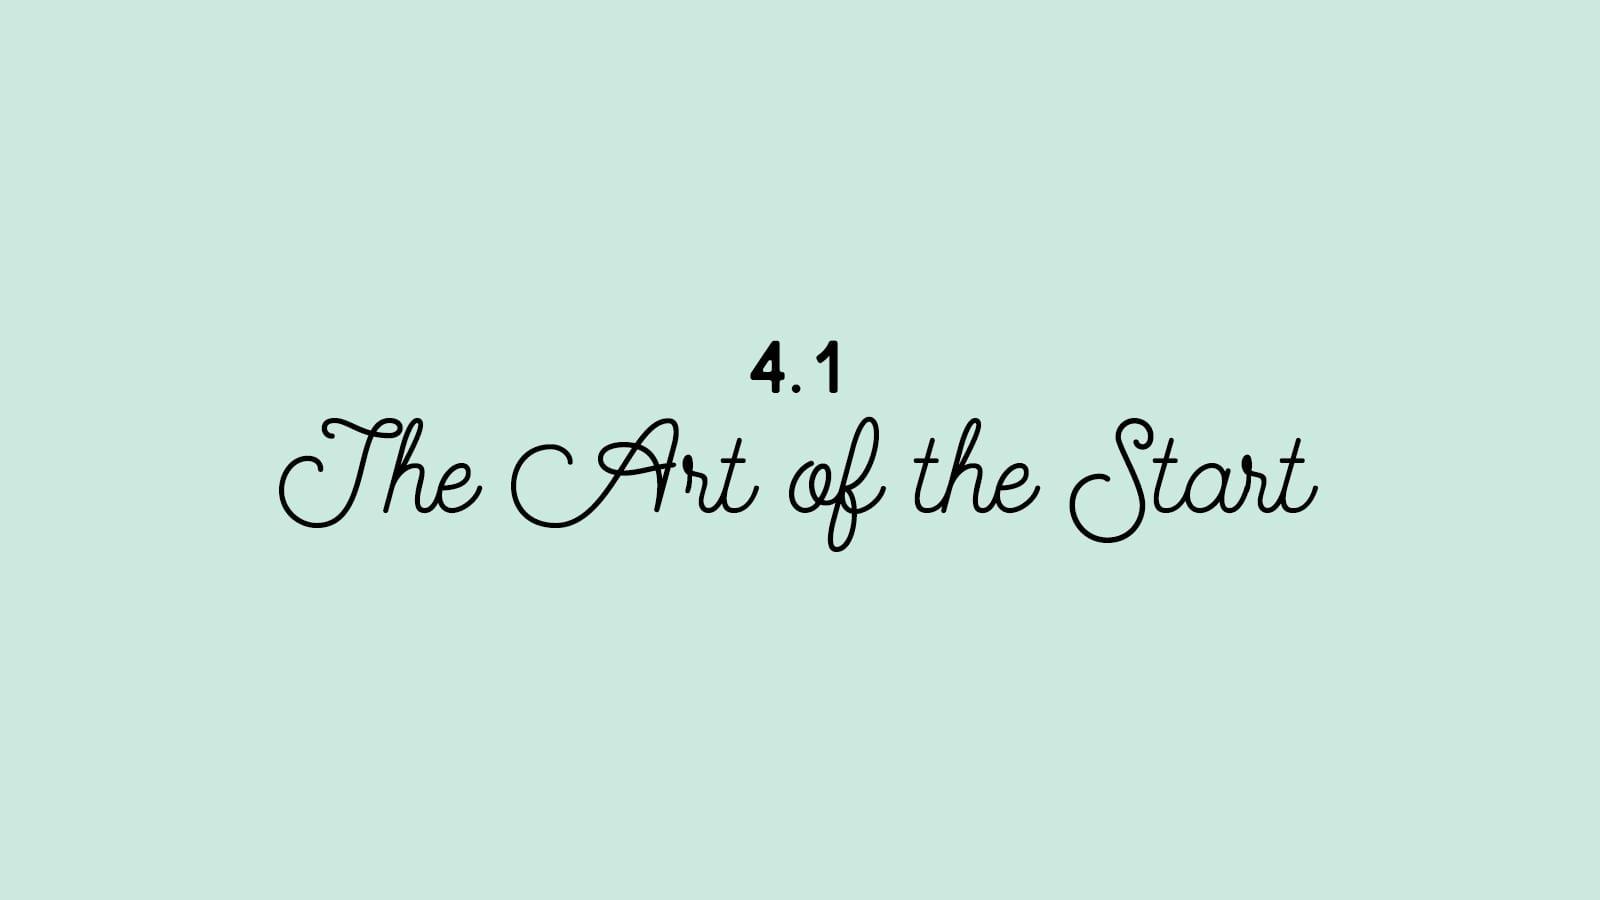 4.1 The Art of the Start